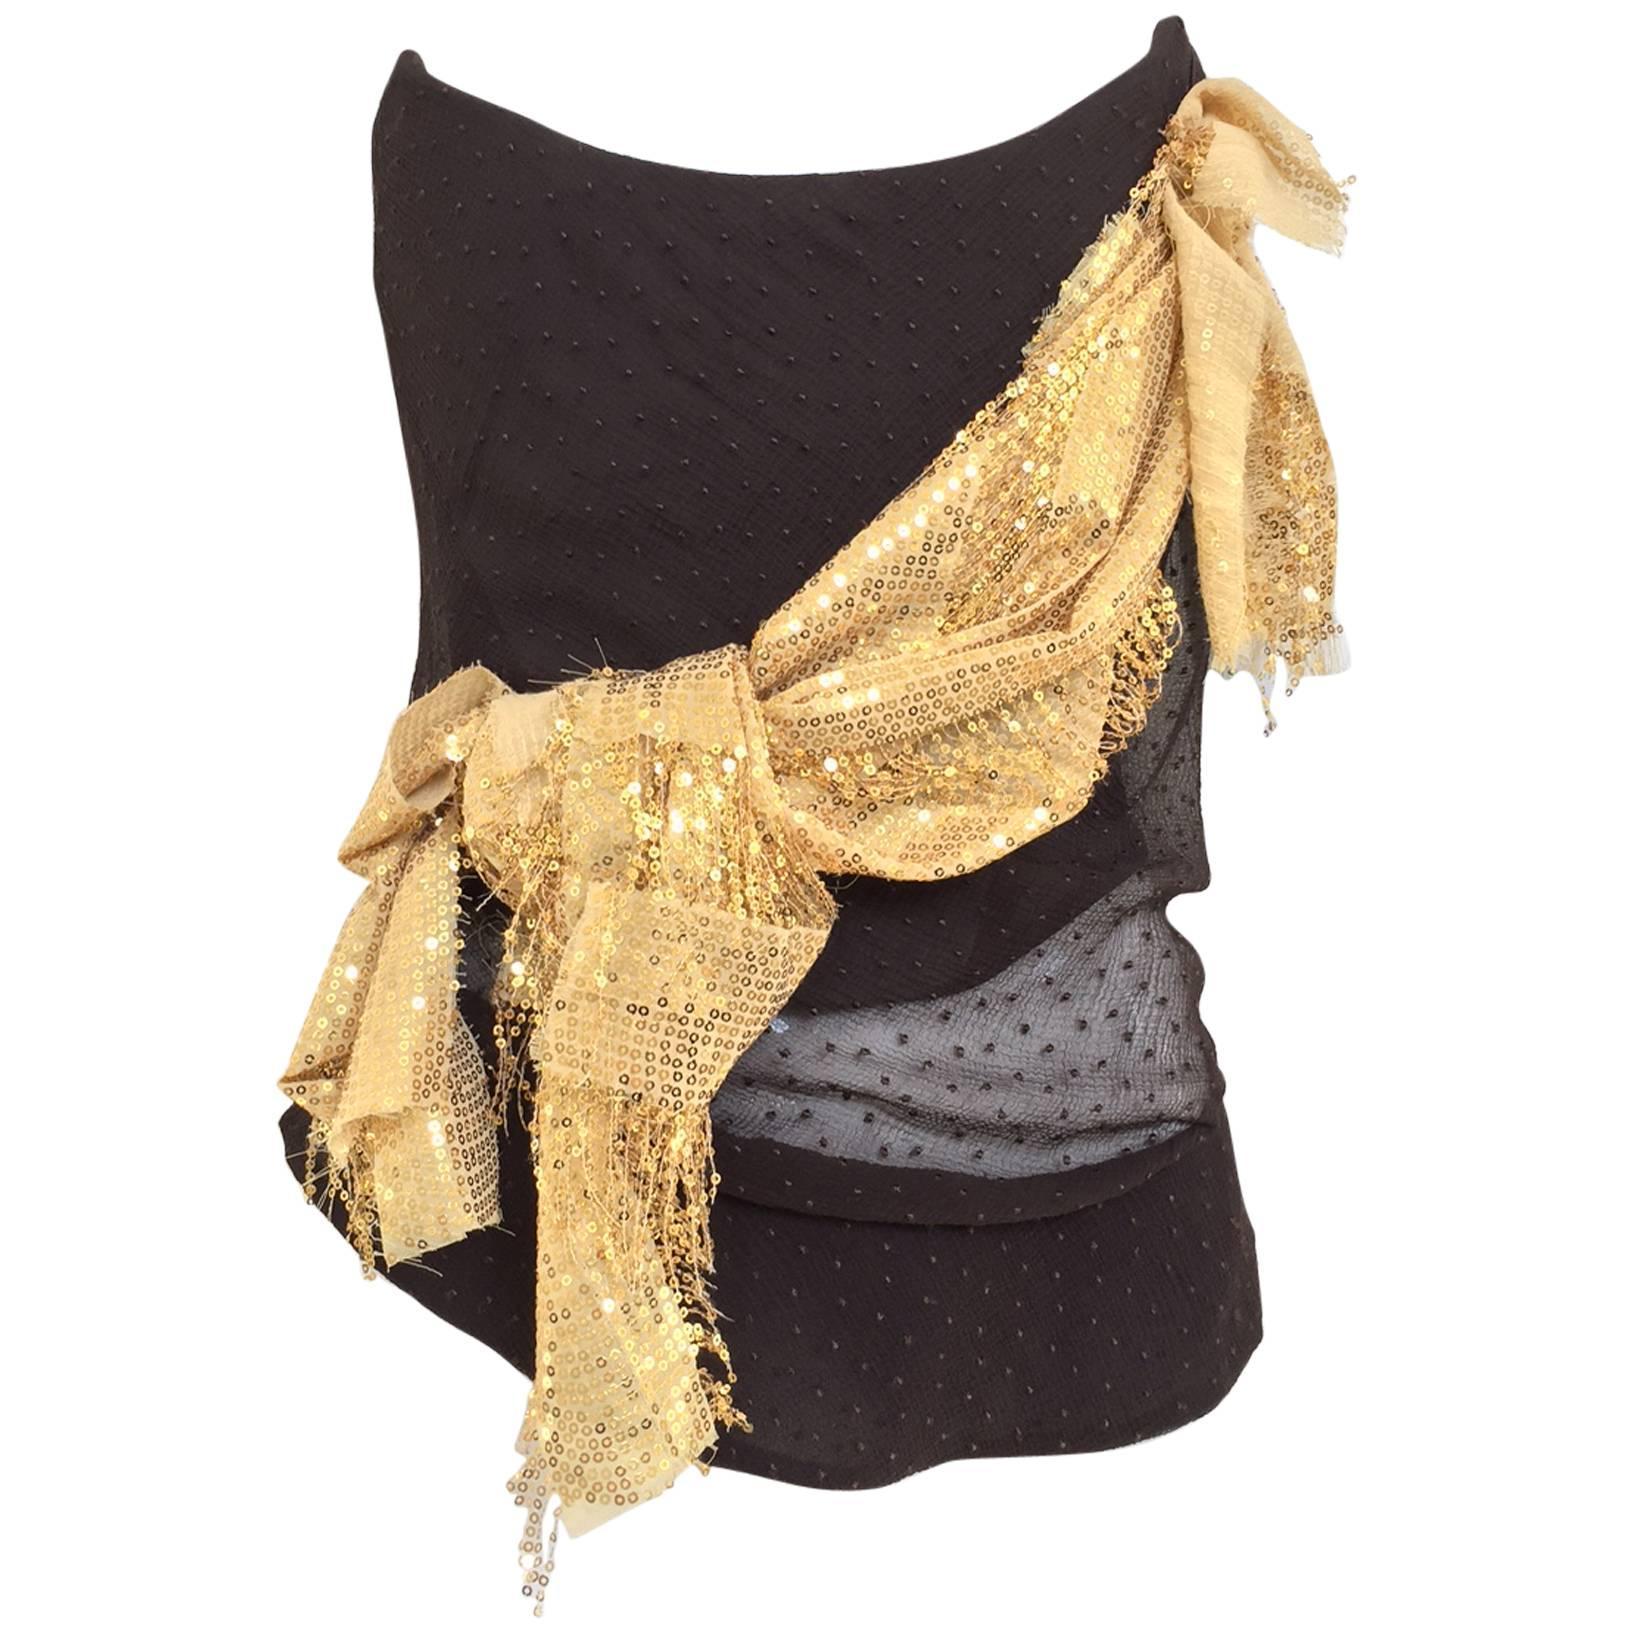 Vintagea  Vivienne Westwood Brown and Gold Silk Bustier